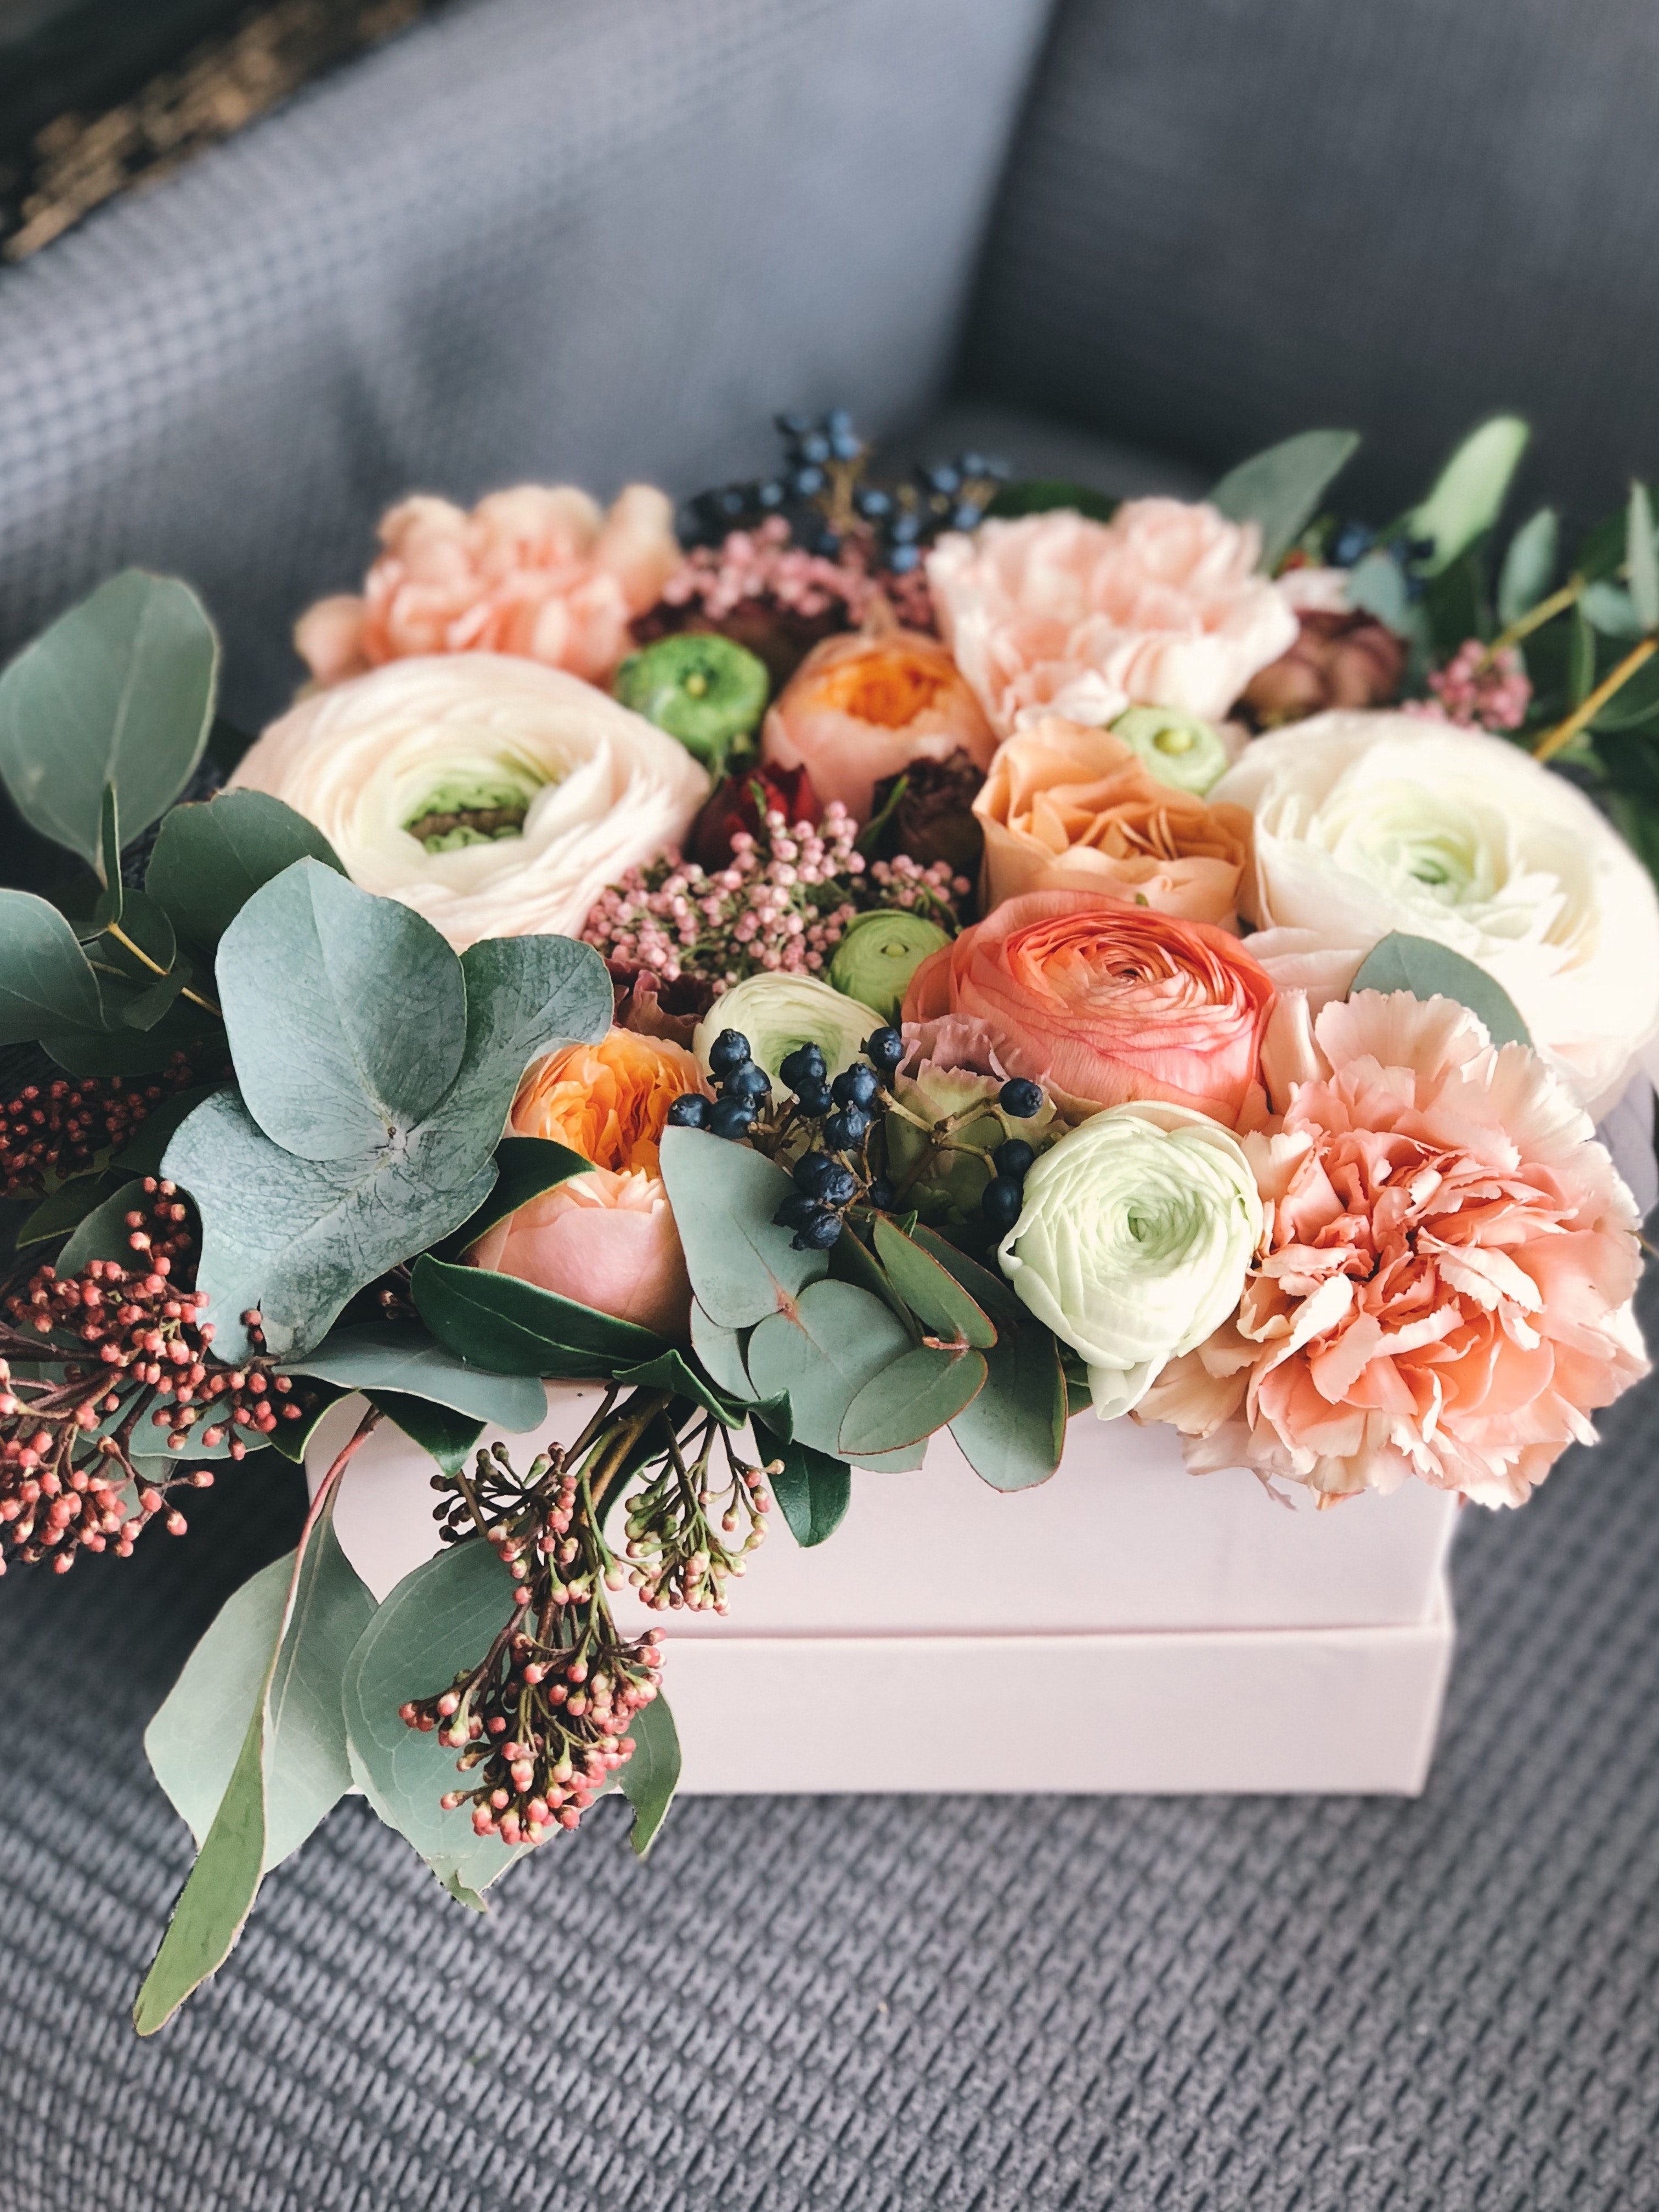 9 Diy Flower Arrangements Perfect For Valentine S Day